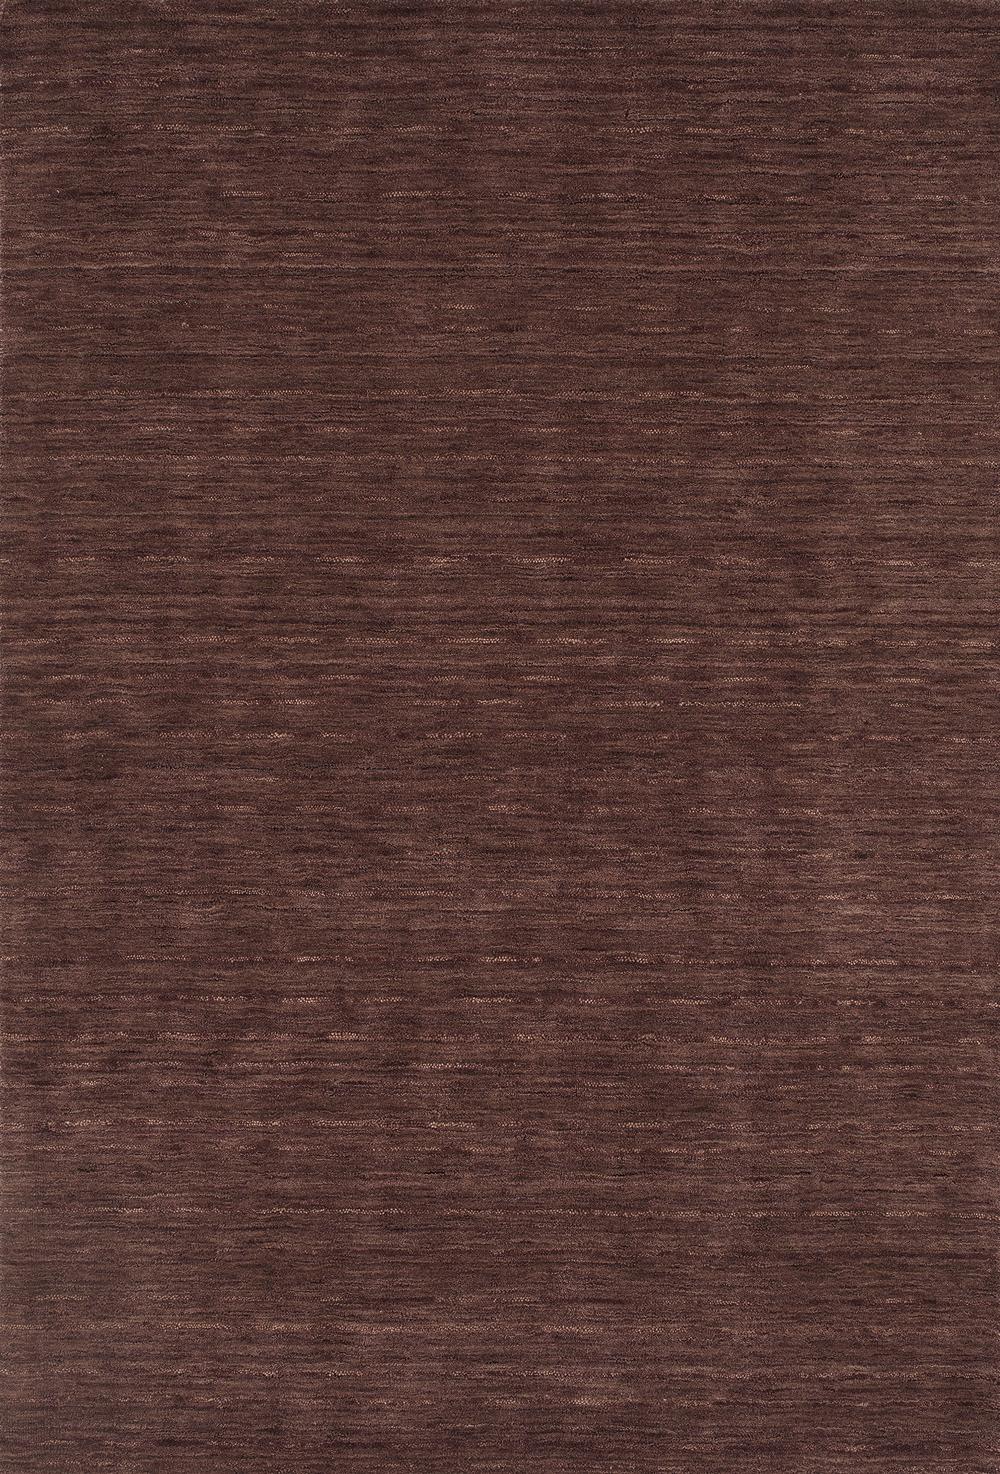 Rafia Plum Gabbeh Dyed Wool Rug Textured Plush Rugs